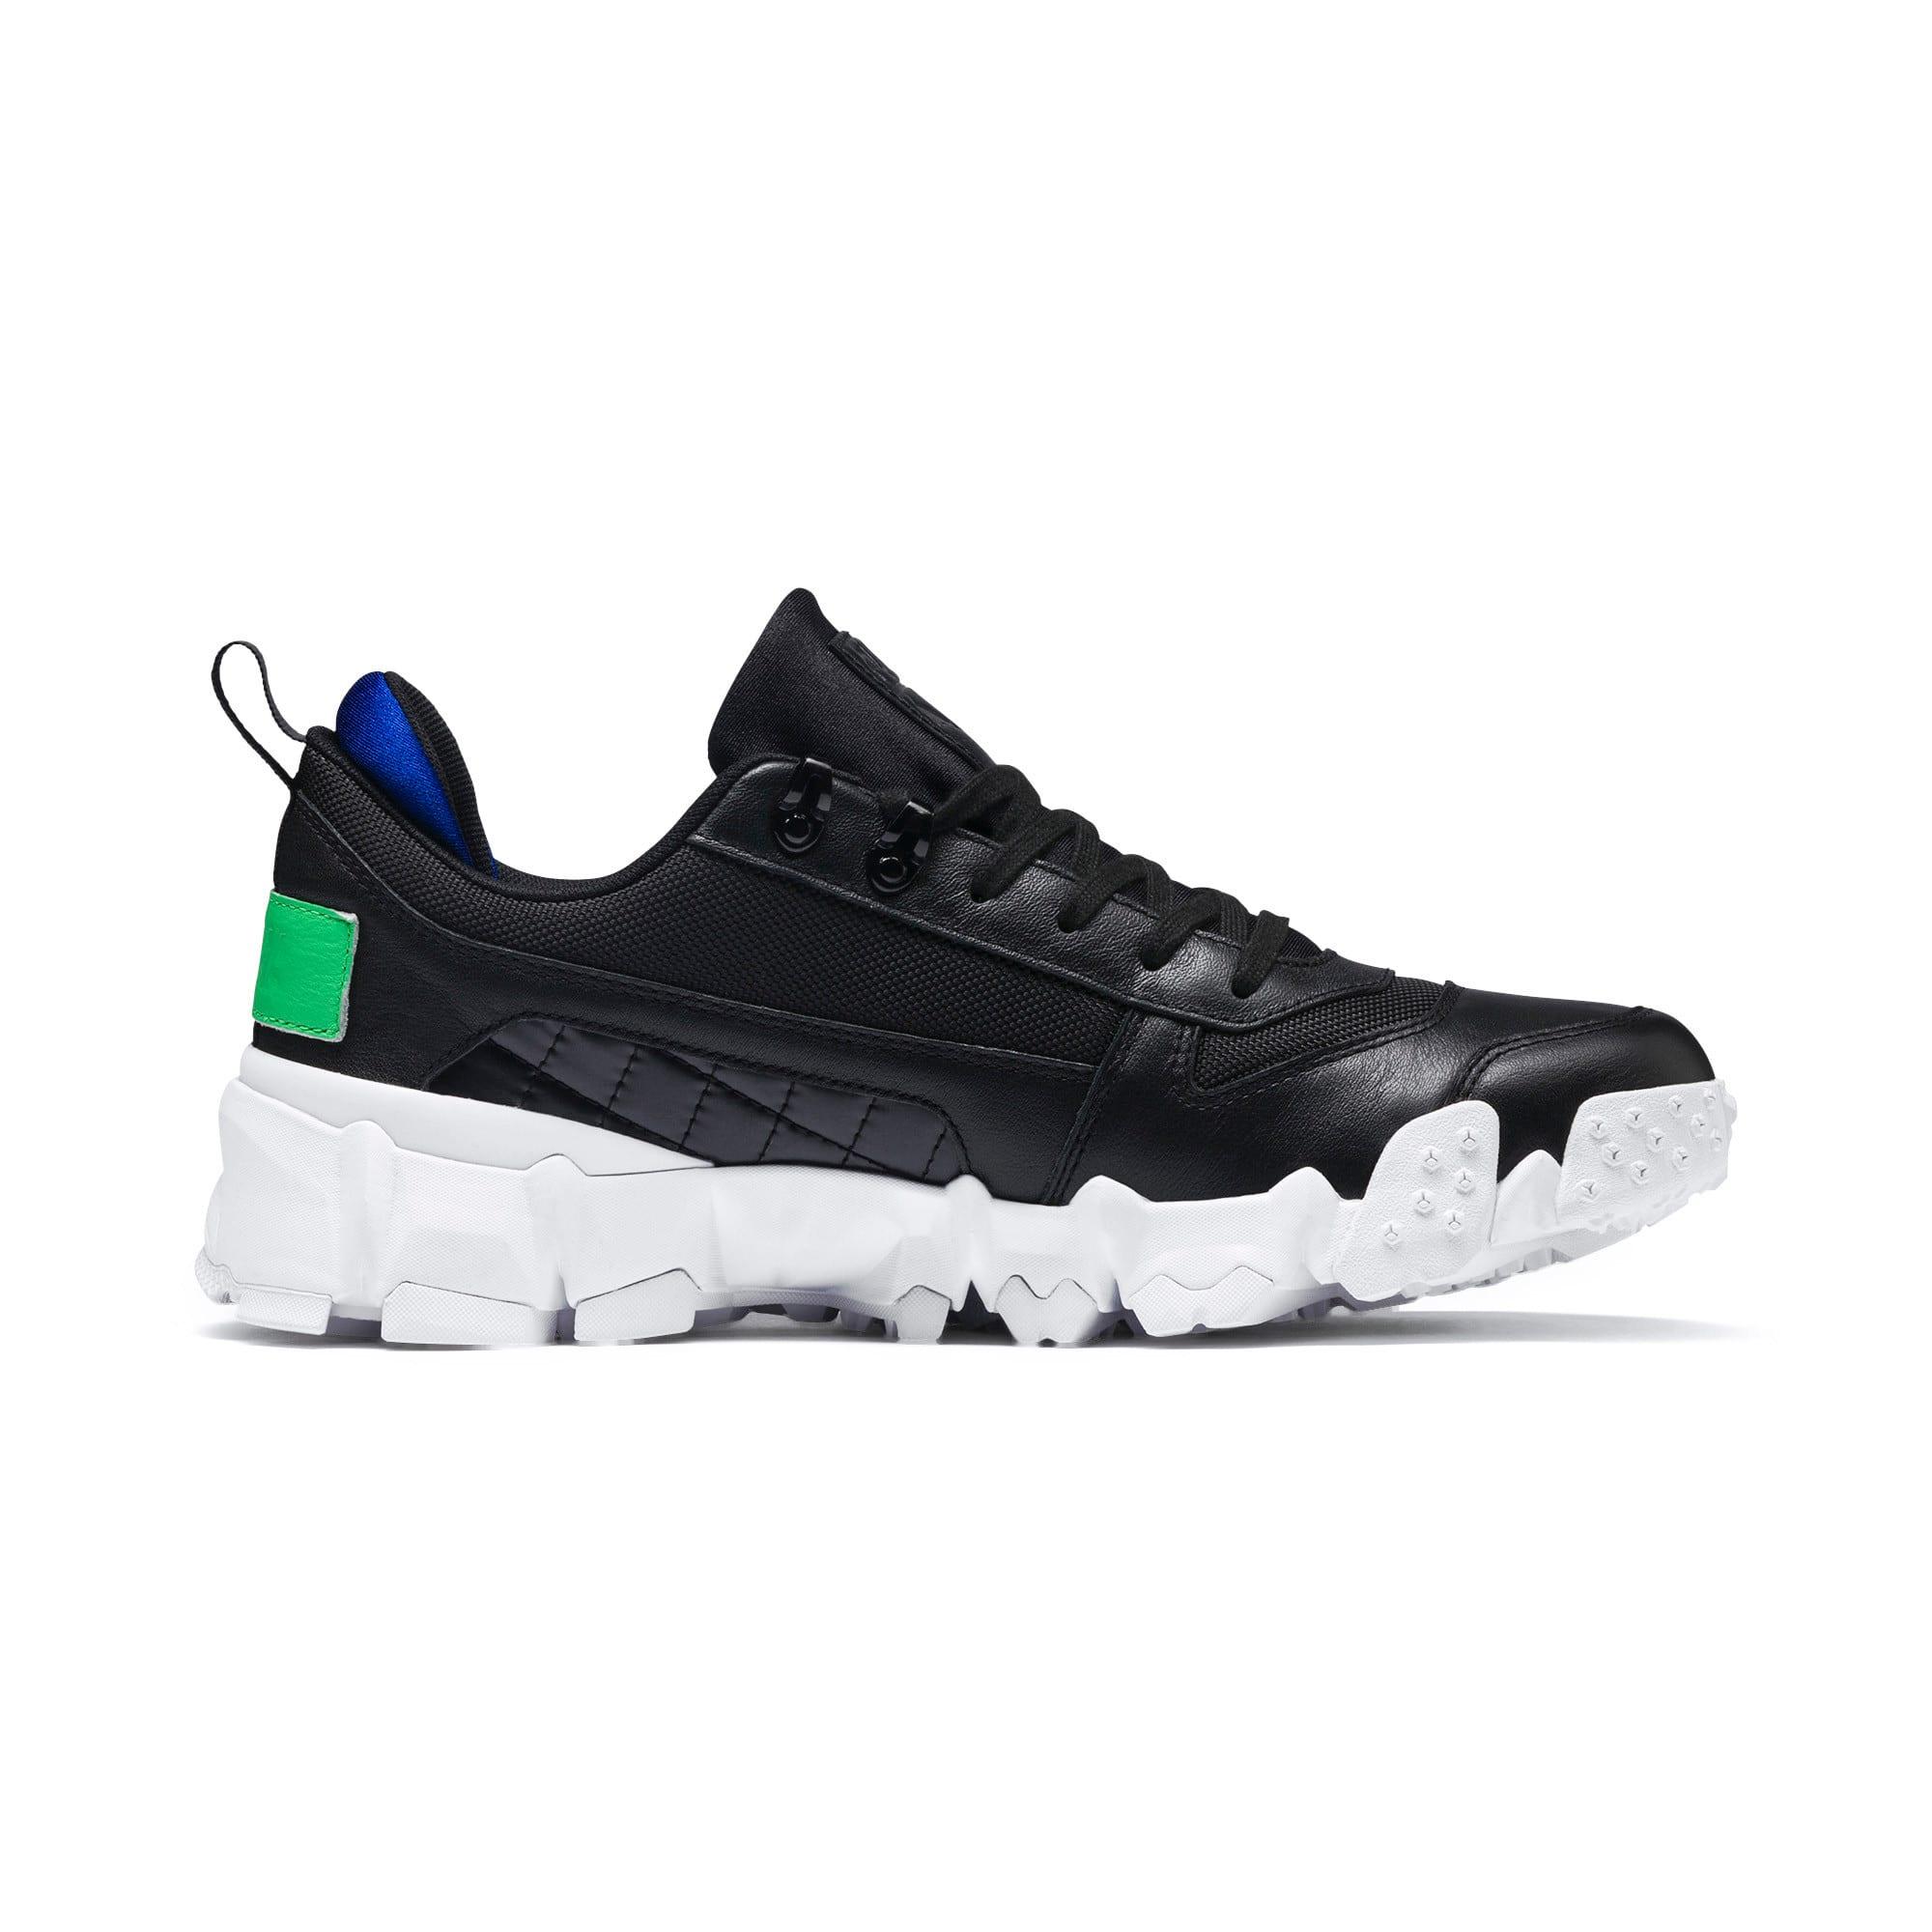 Thumbnail 6 of Trailfox Leather Sneakers, Puma Black-Irish Green, medium